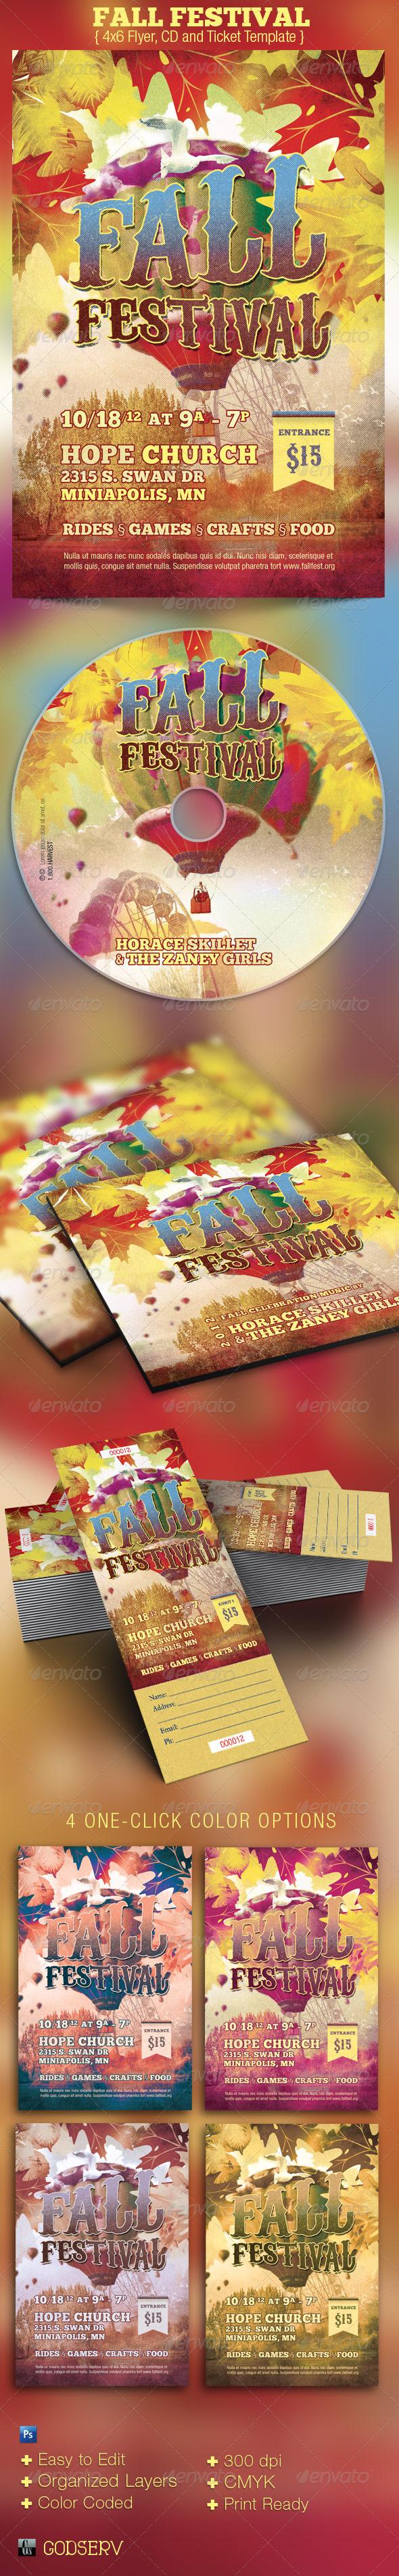 Fall Festival Church Flyer, CD and Ticket Template - Church Flyers